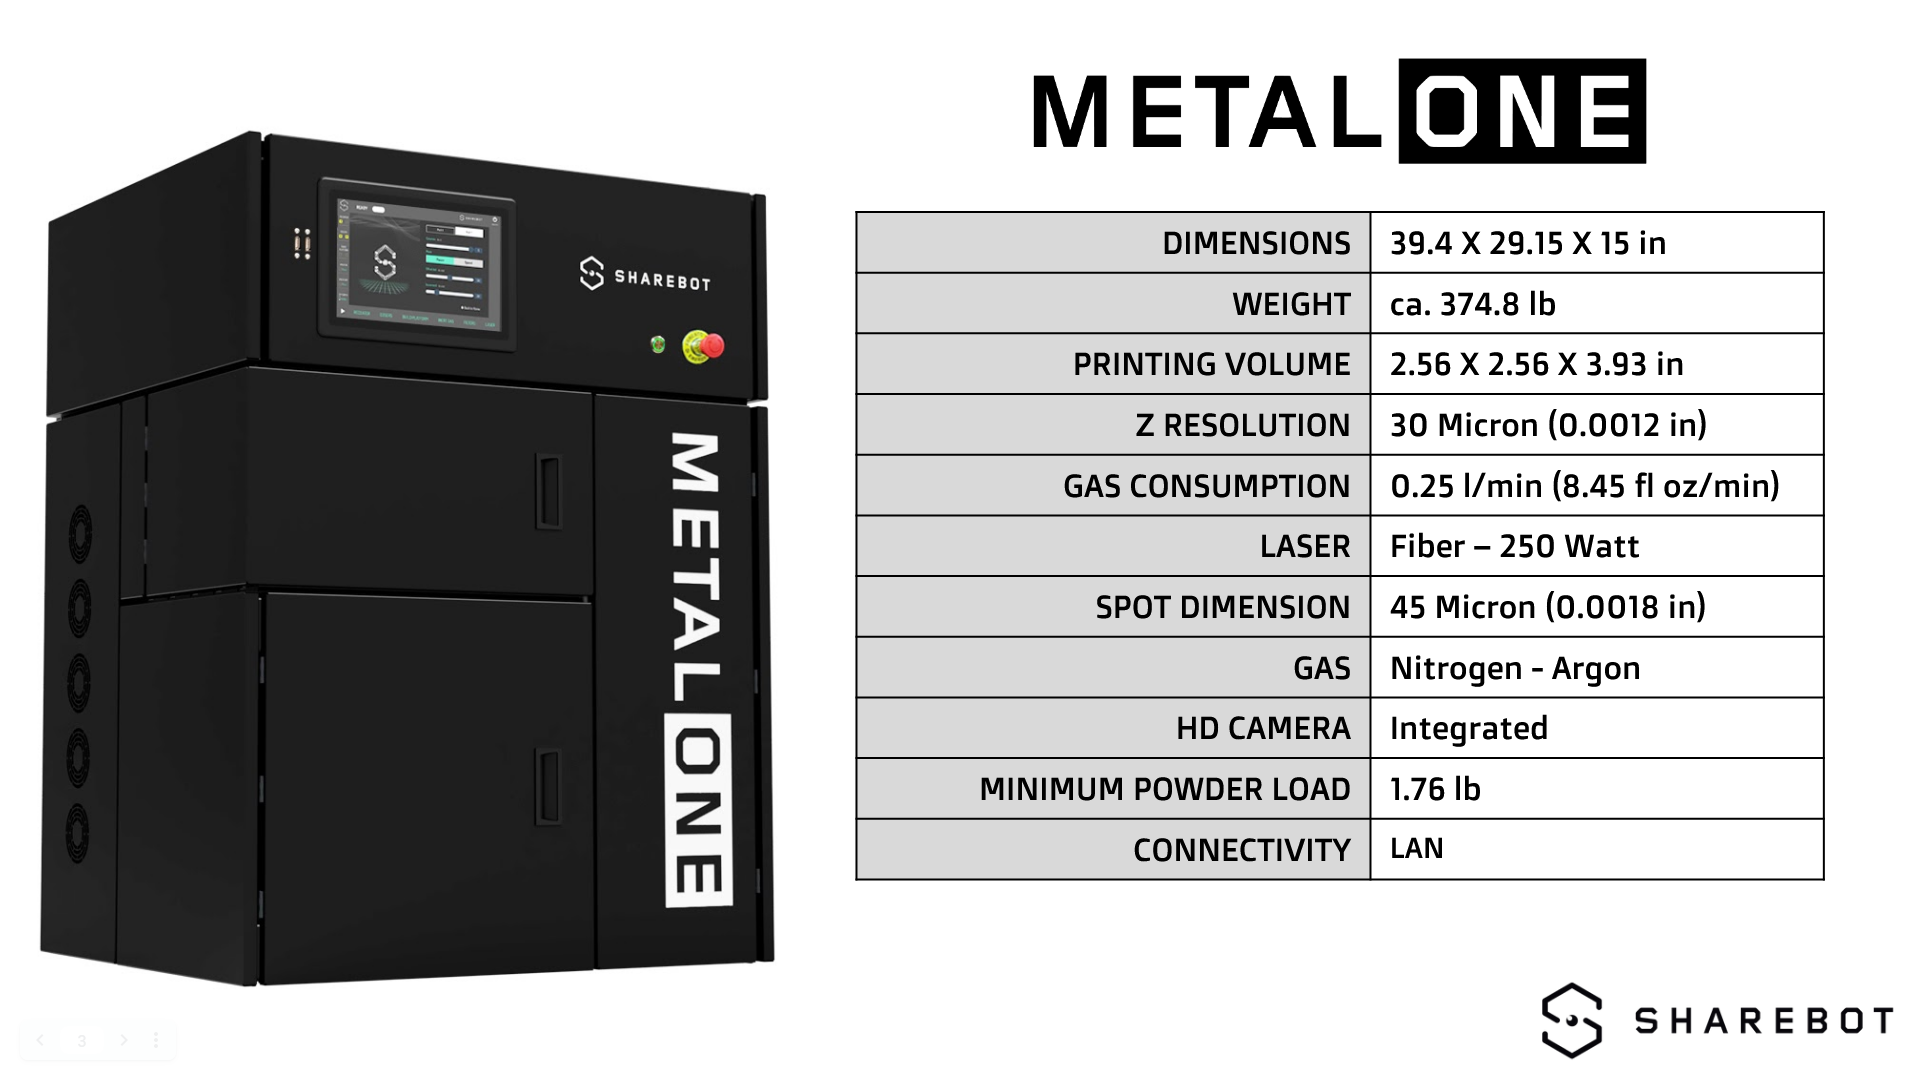 metalONE US Technical Specs